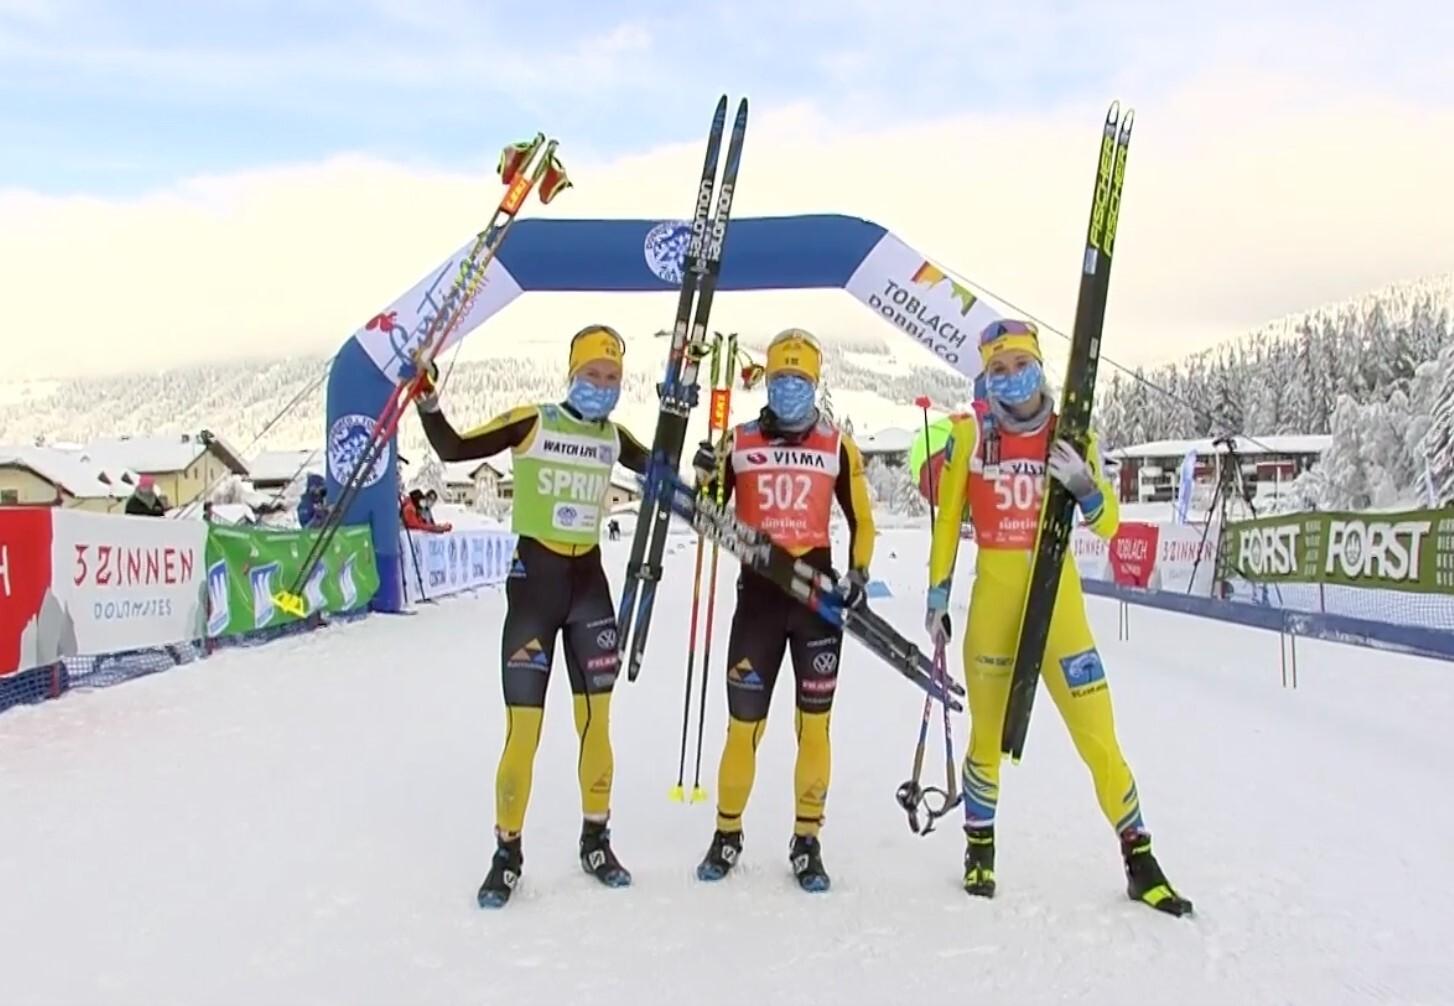 Topp3_kvinner_Toblach-Cortina.jpg